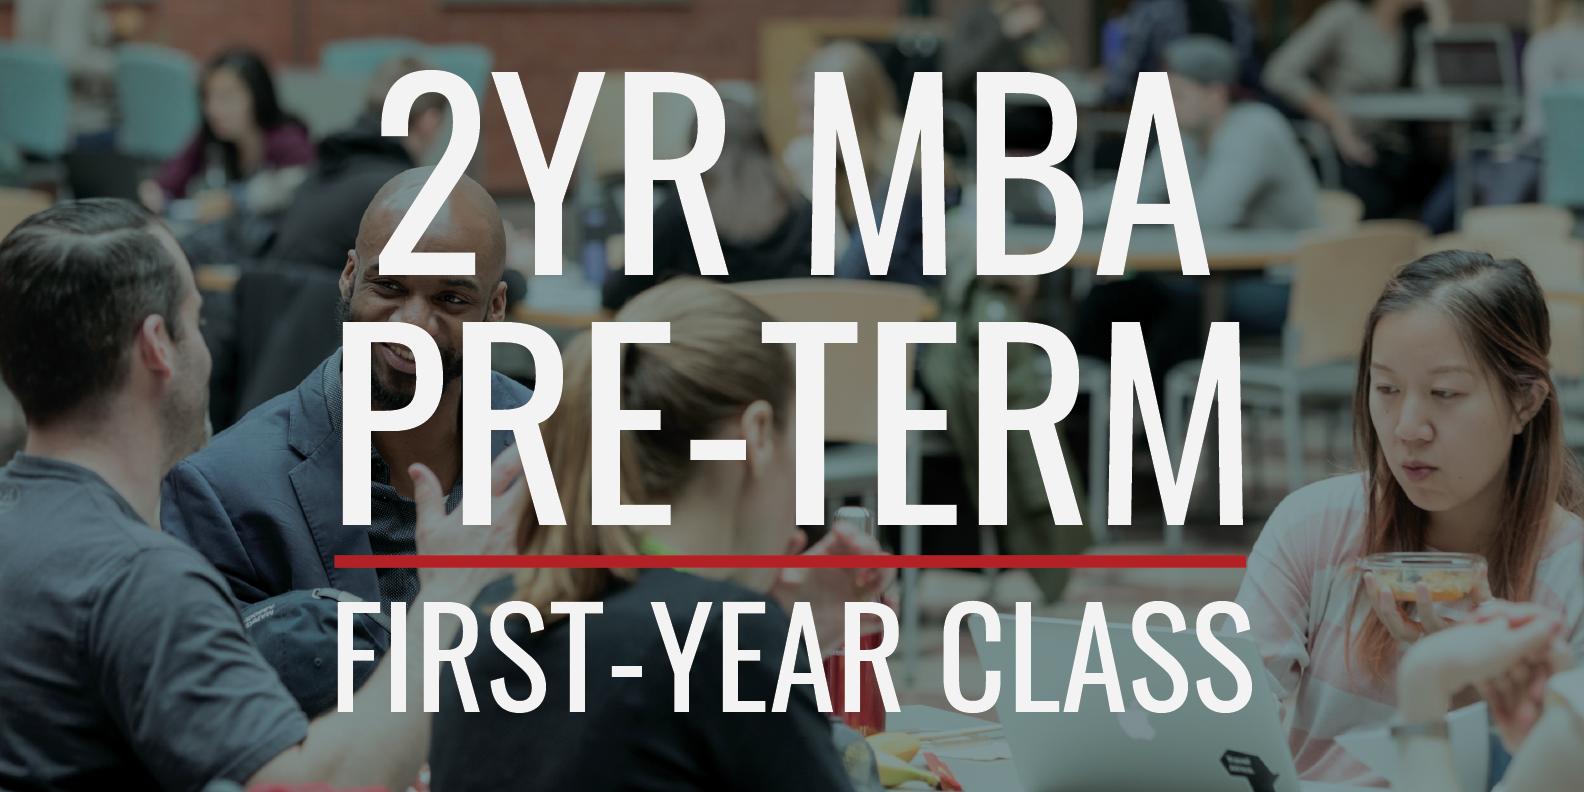 2YR MBA Class of 2022 Pre-Term